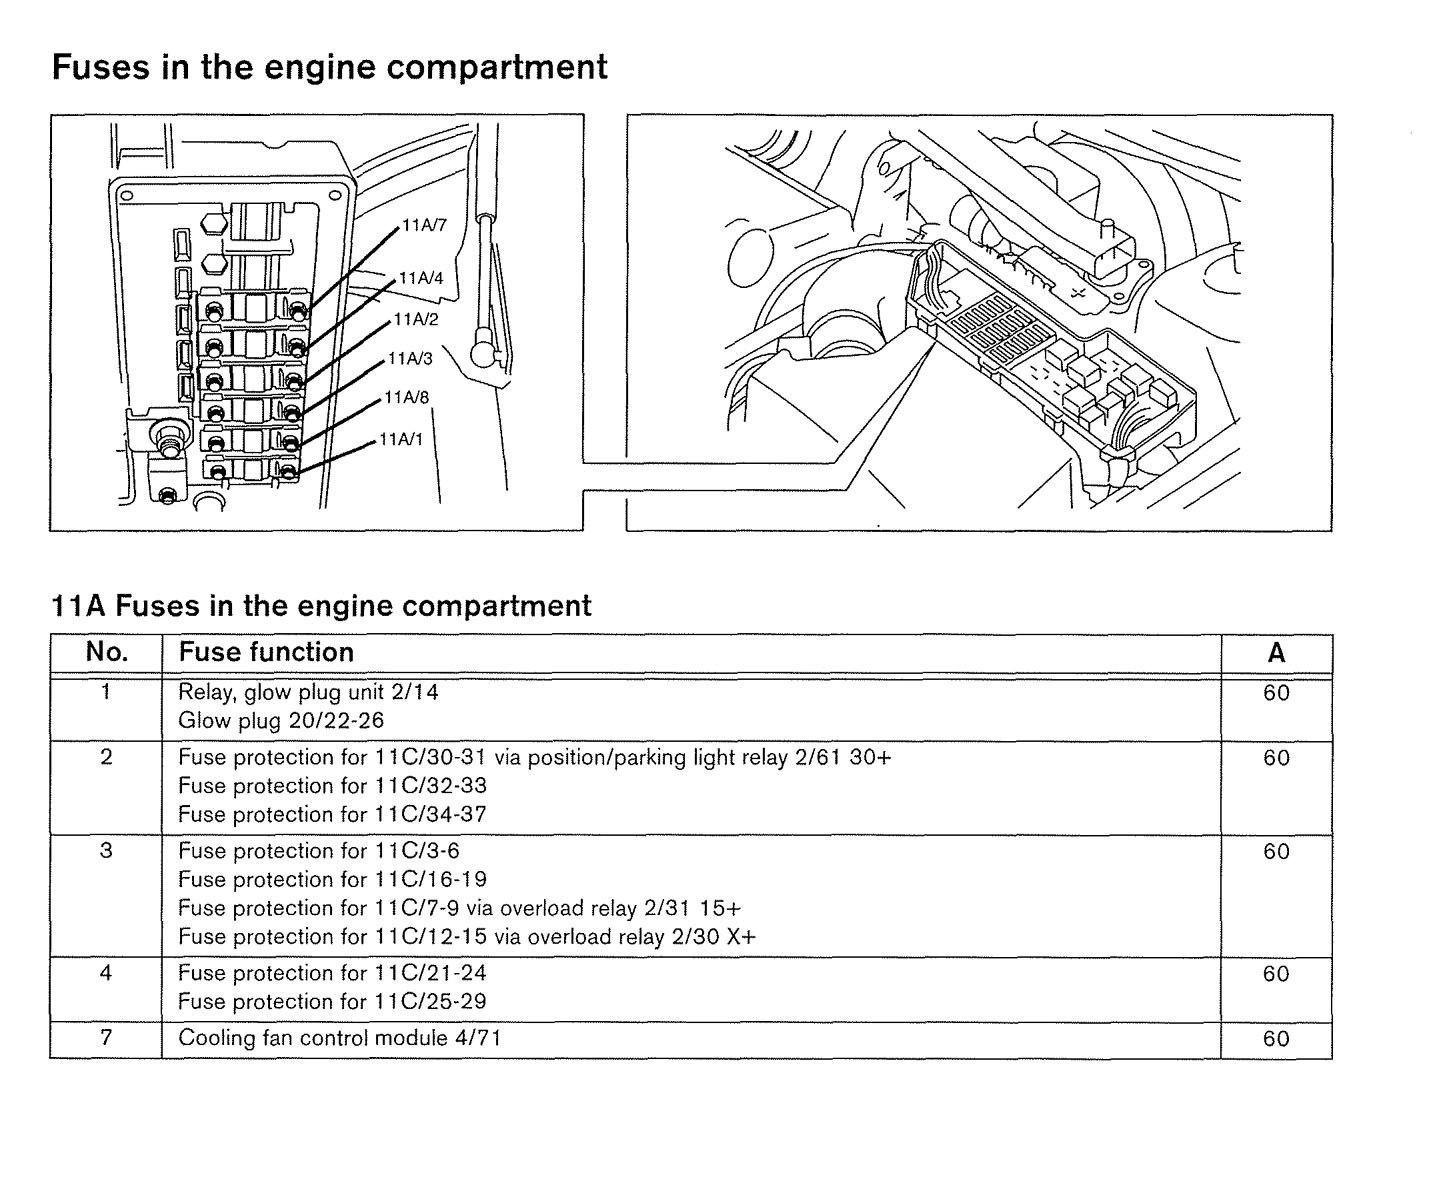 Volvo S60 Rear Fuse Box - L175 Wiring Diagram -  goldwings.yenpancane.jeanjaures37.fr | 2014 Volvo S60 Fuse Diagram |  | Wiring Diagram Resource